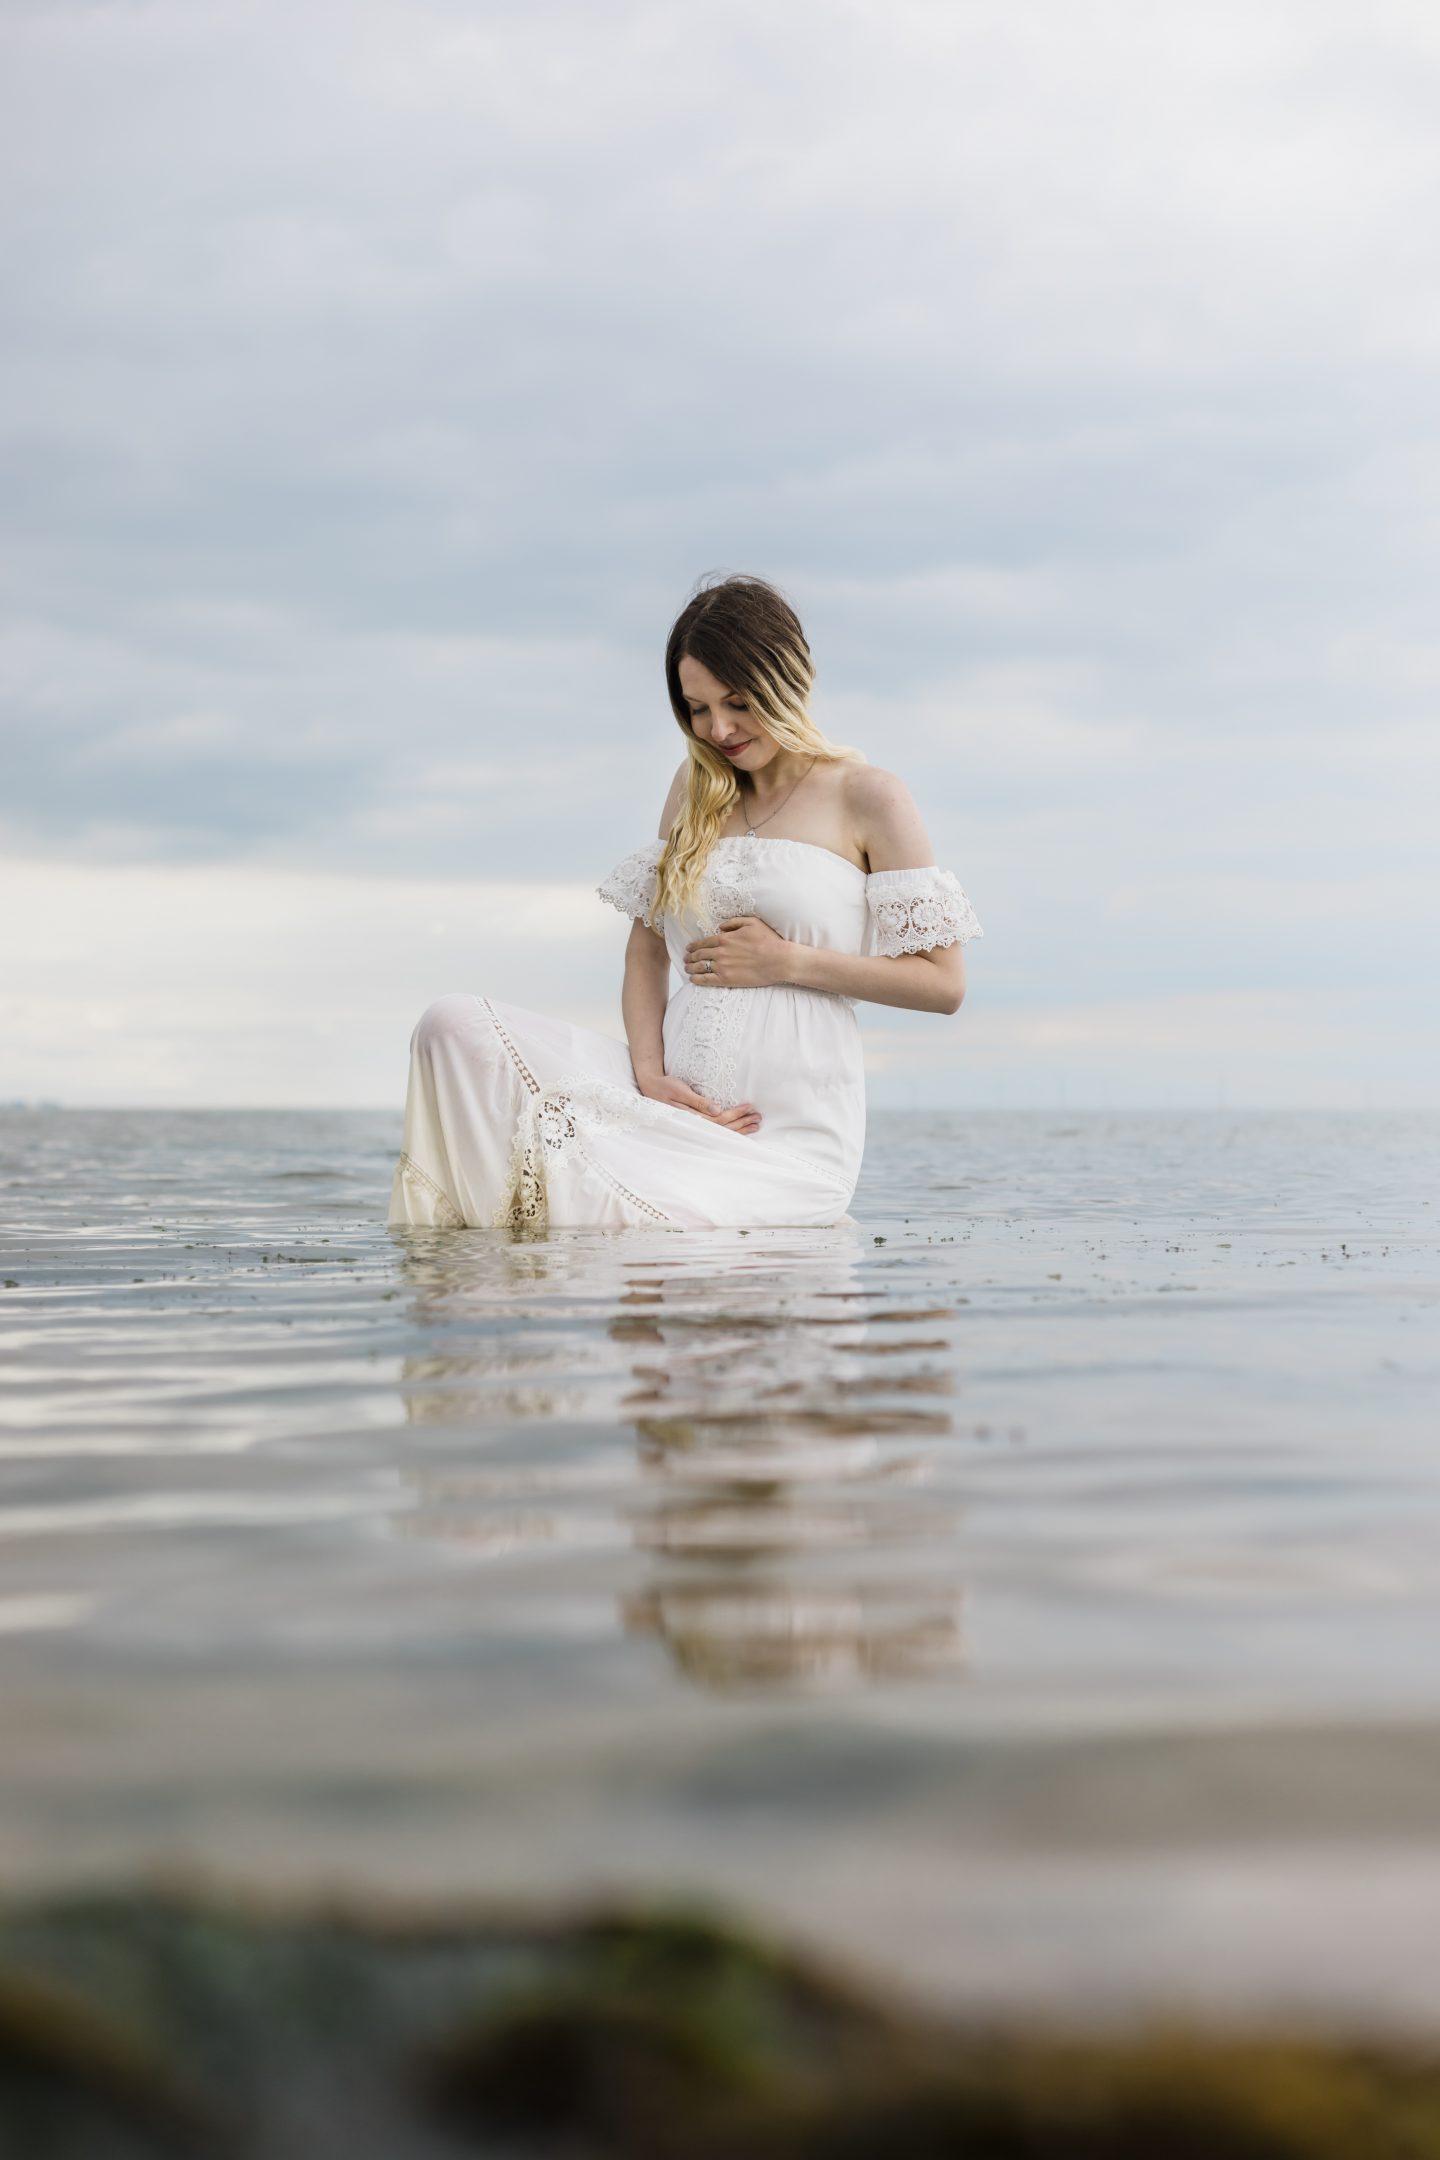 Cradling baby bump in the sea